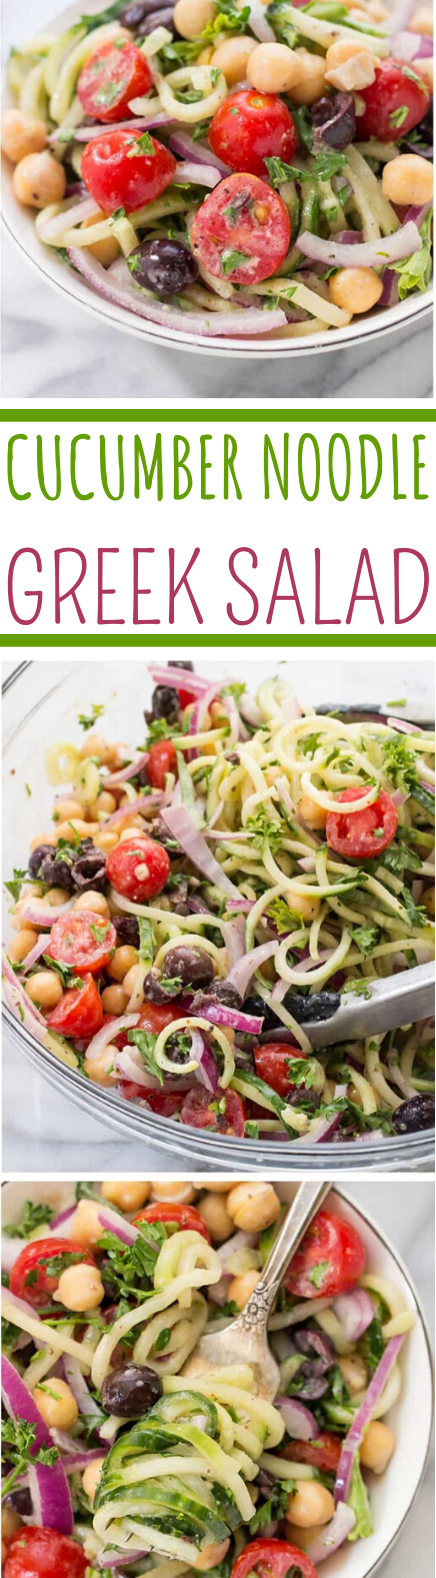 Vegan Cucumber Noodle Greek Salad #vegan #healthy #glutenfree #salad #plantbased